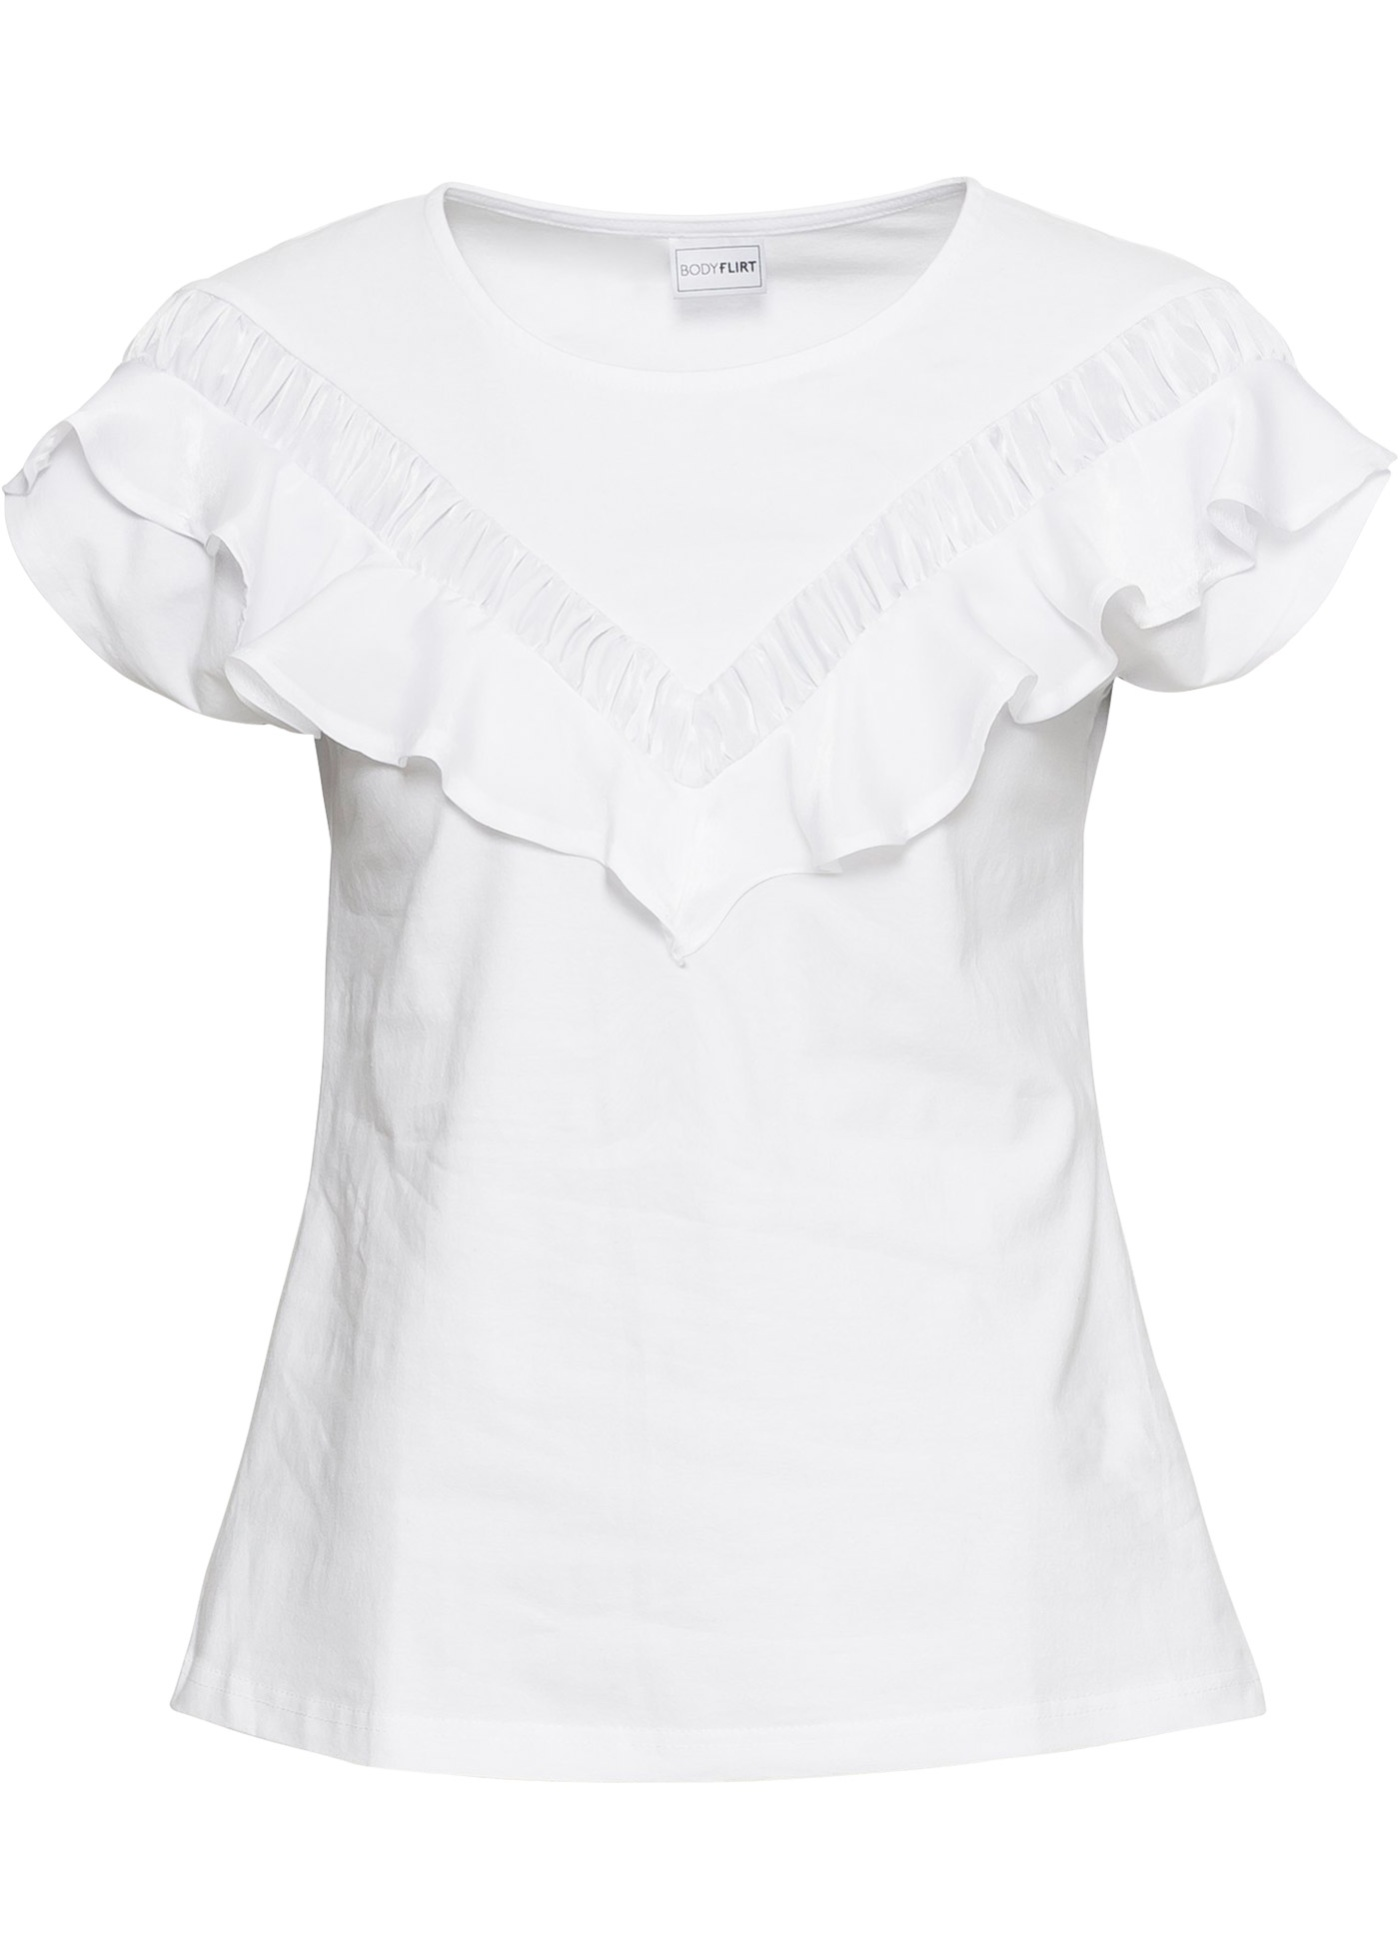 Bodyflirt Blanc shirt Courtes Femme Pour Manches BonprixT yfYbg76